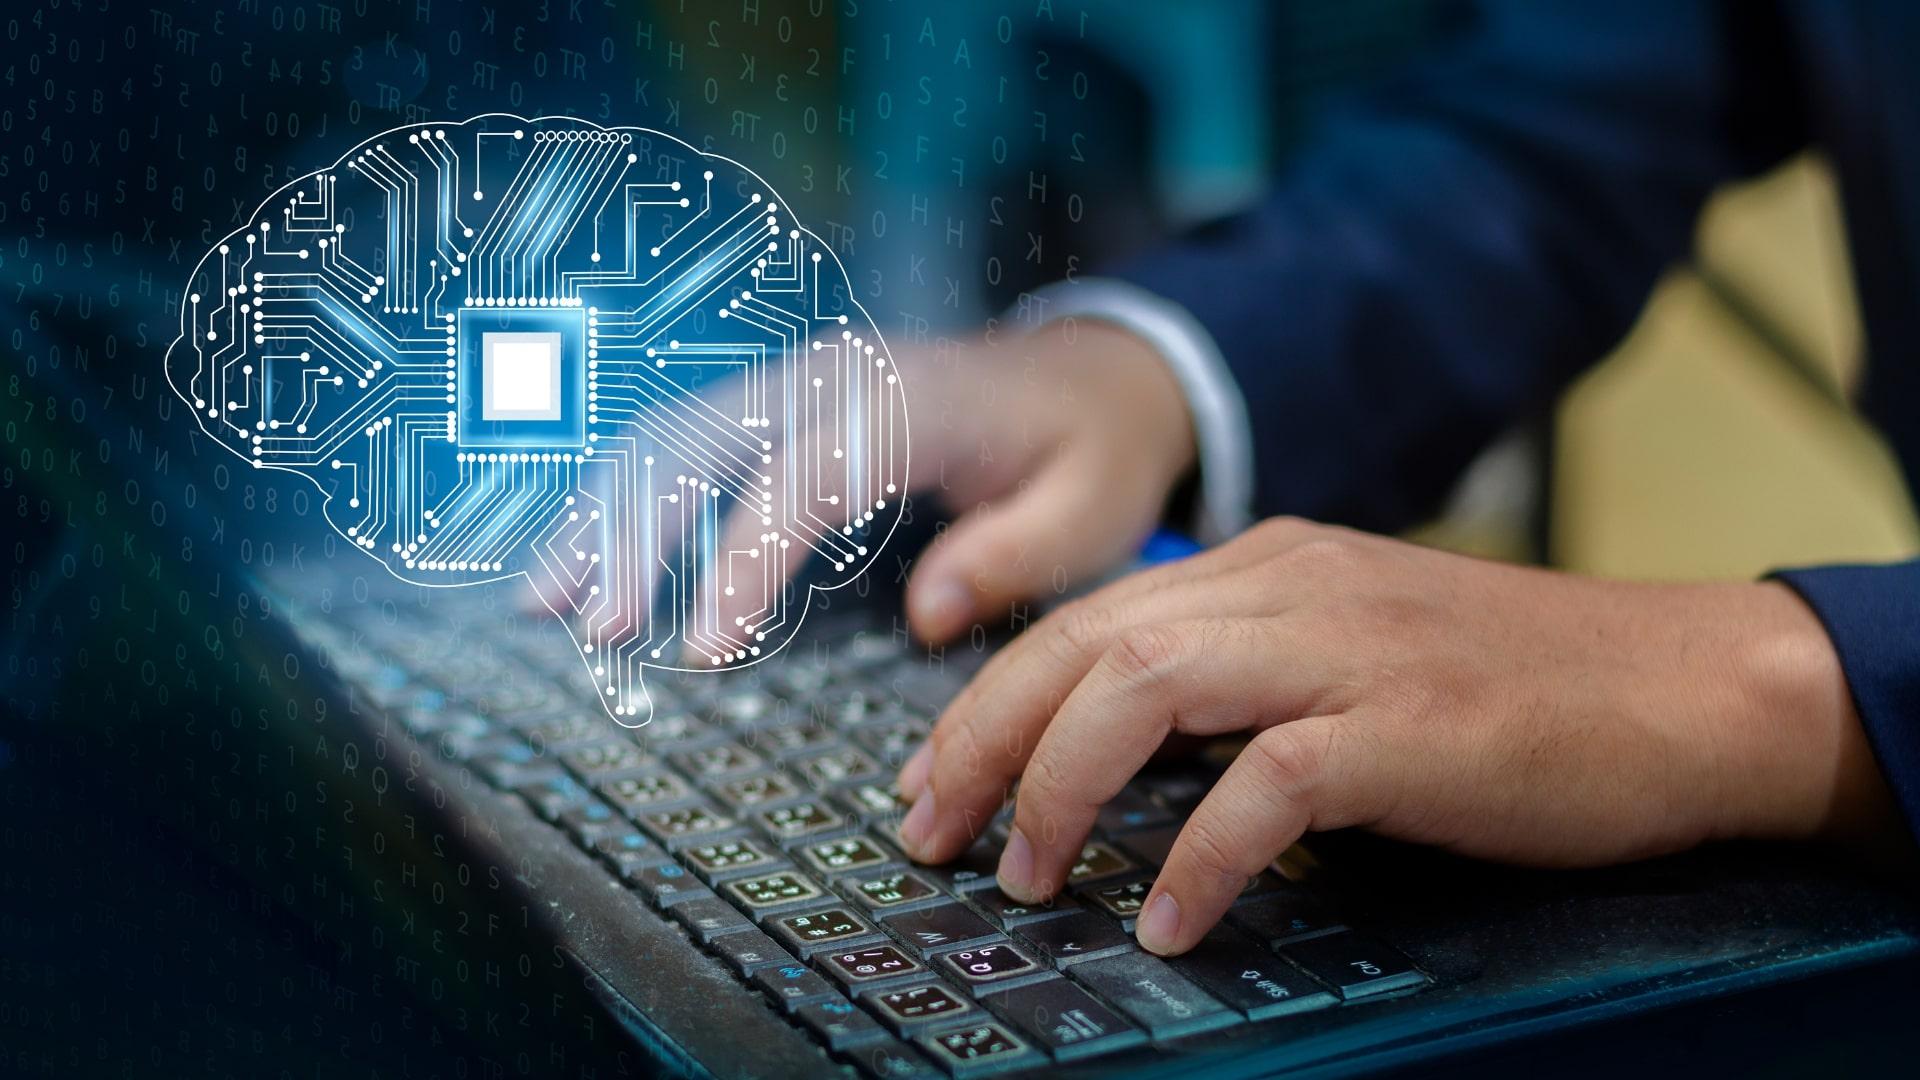 Read more about the article Πληροφορική – Ειδικεύσεις 1. Ασφάλεια Κυβερνοχώρου, 2. Κινητά Συστήματα, 3. Τεχνολογίες Blockchain (MSc, 1.5 έτος ή 3 Εξάμηνα) – Εξ Αποστάσεως